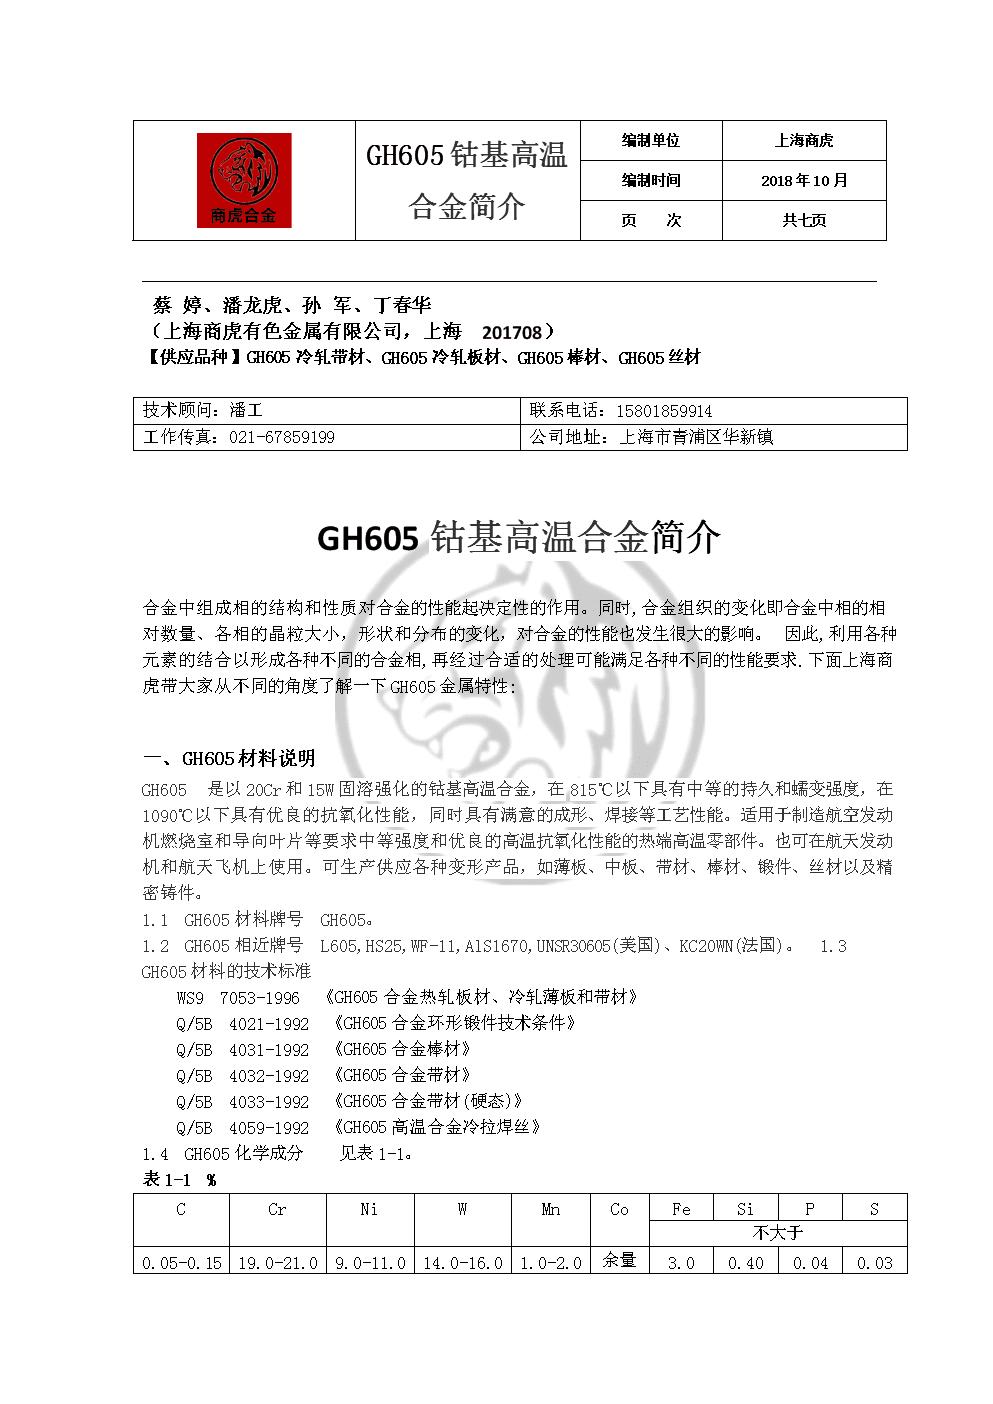 GH605合金特性及应用-上海商虎合金技术.doc